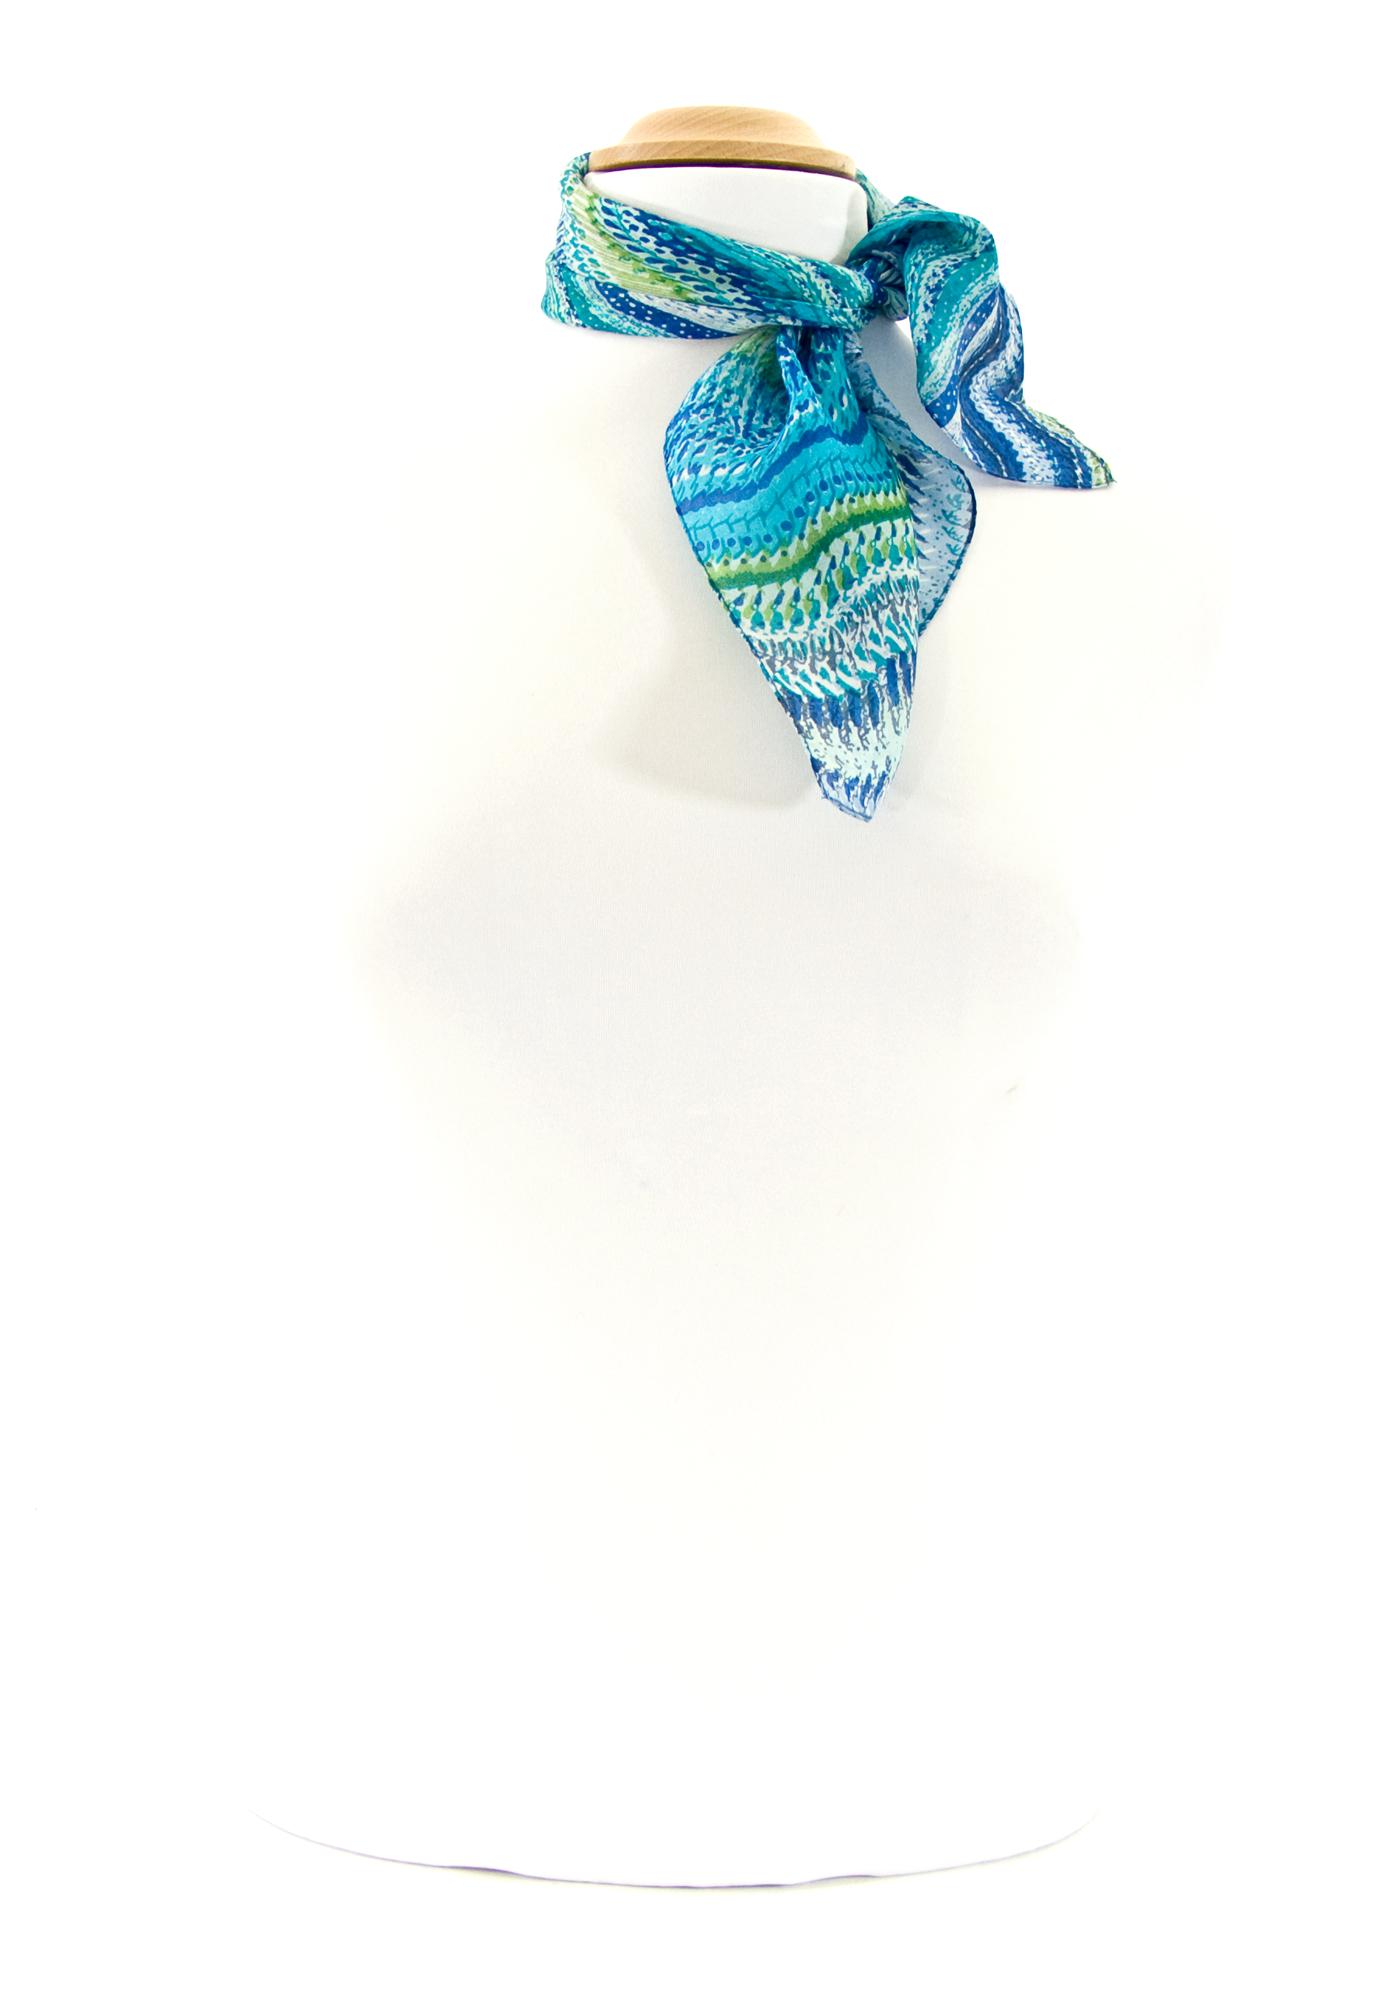 Foulard en soie volutes bleu 50 x 50 cm Palme  mesecharpes.com http ... 9df6bcf86e7